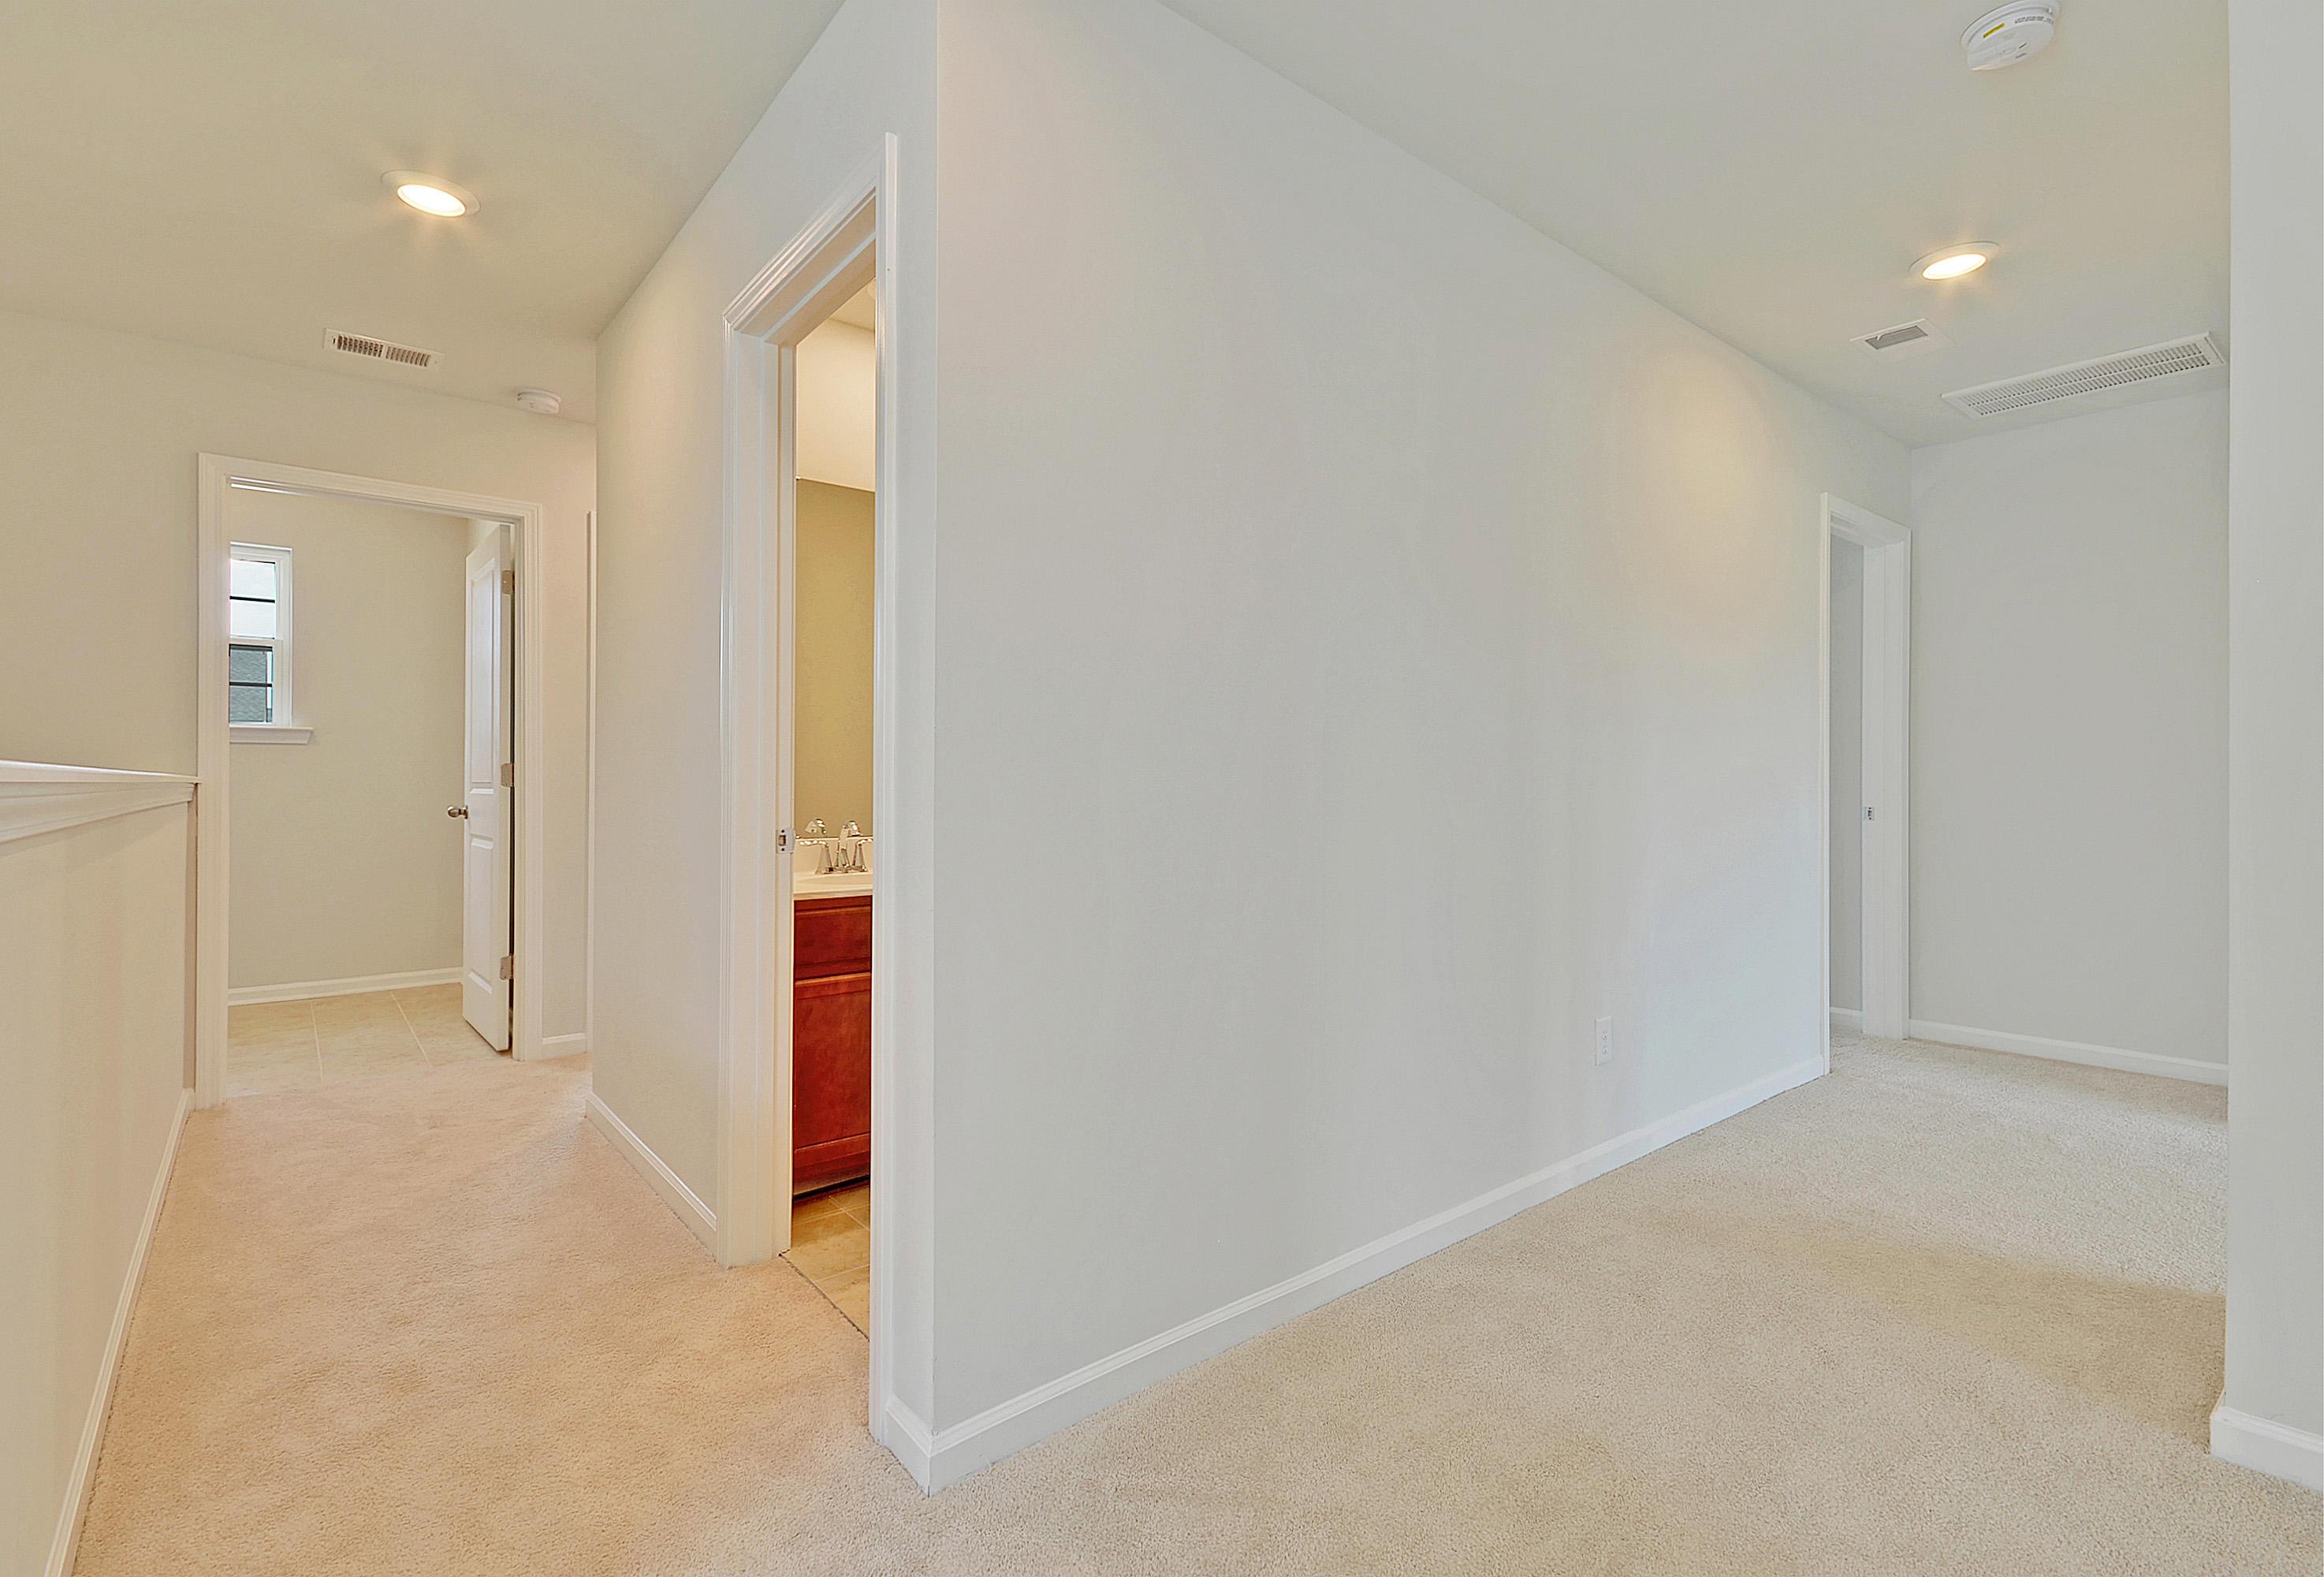 Coosaw Preserve Homes For Sale - 5162 Preserve Blvd, Ladson, SC - 11